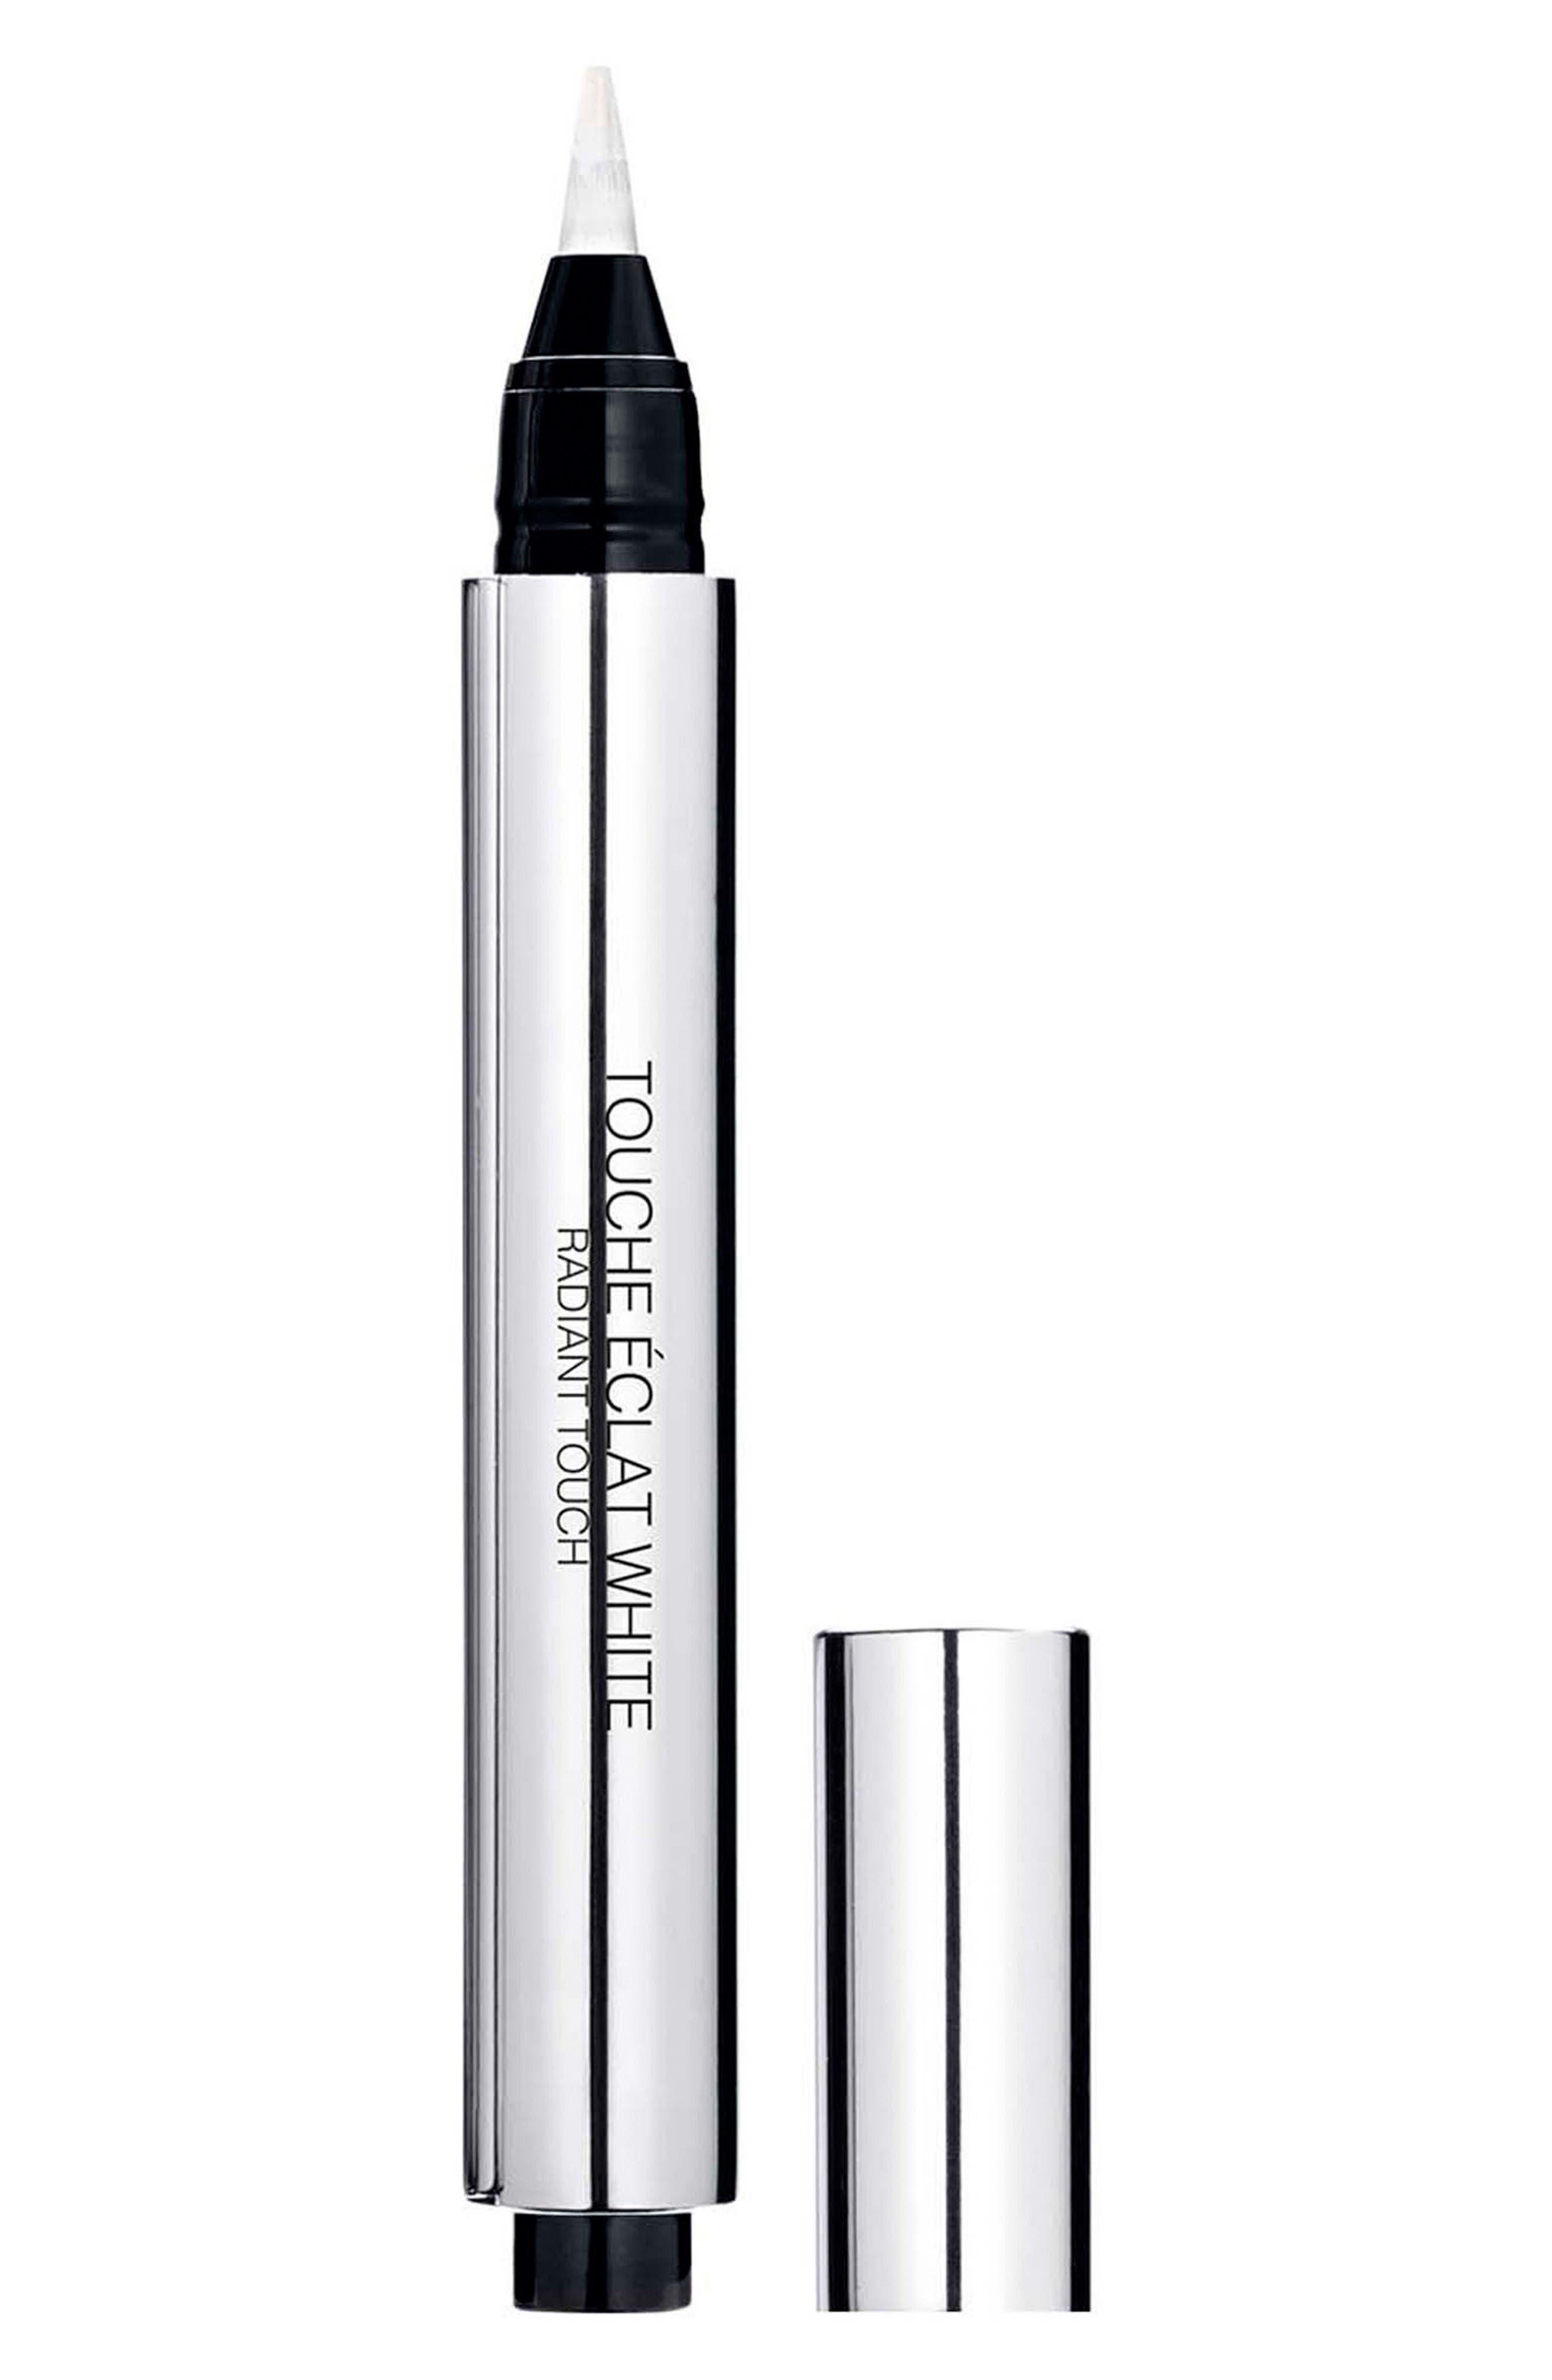 Yves Saint Laurent Touche Éclat White Ultra Brightening Pen (Limited Edition)